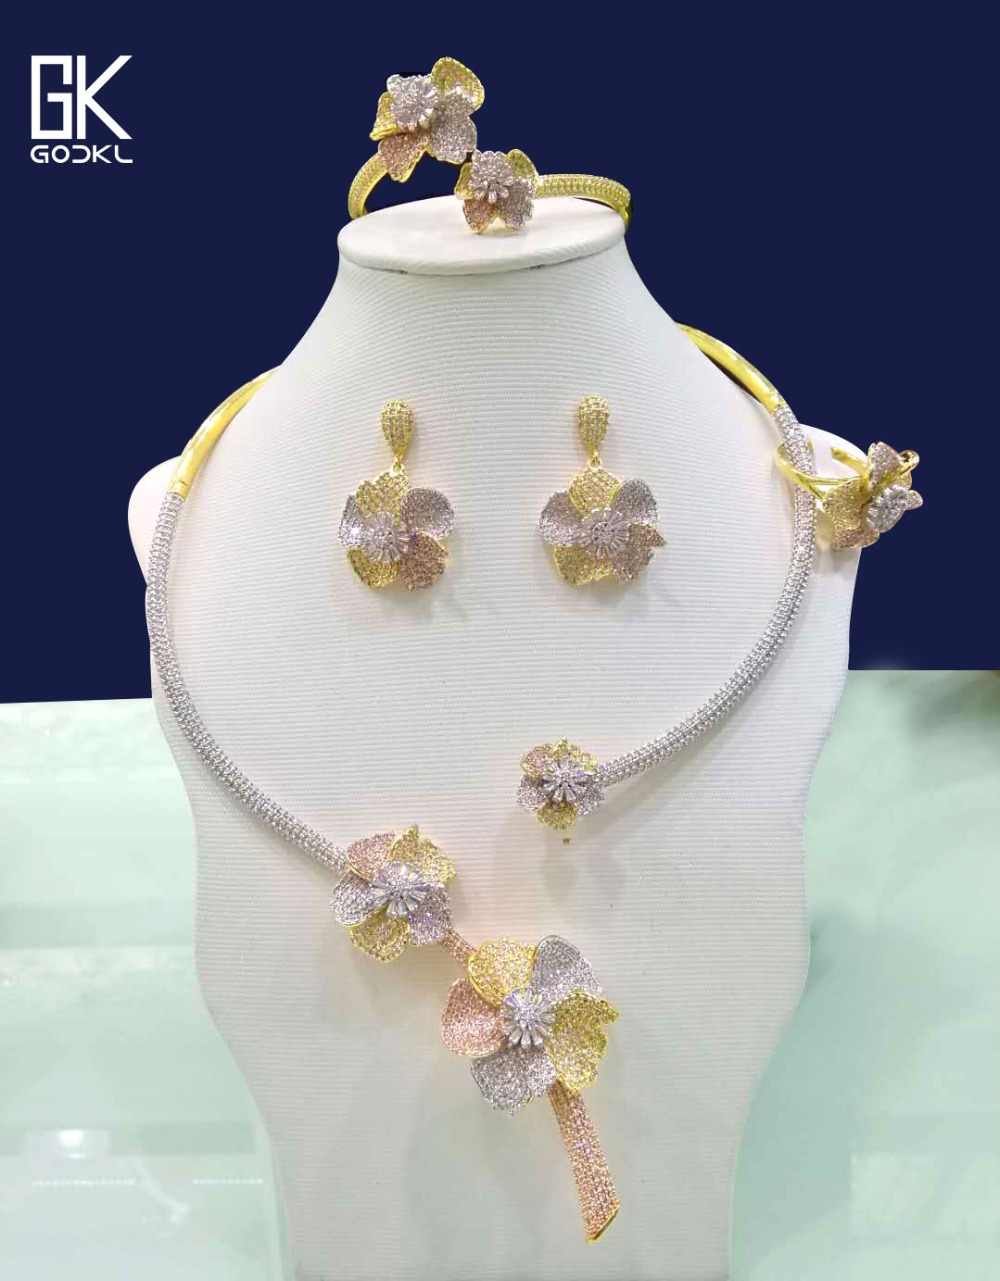 GODKI ดอกไม้หรูหราชุดเครื่องประดับสำหรับงานแต่งงาน Zircon CZ แอฟริกัน Gold สร้อยคอต่างหูชุดดูไบเครื่องประดับชุดเจ้าสาว